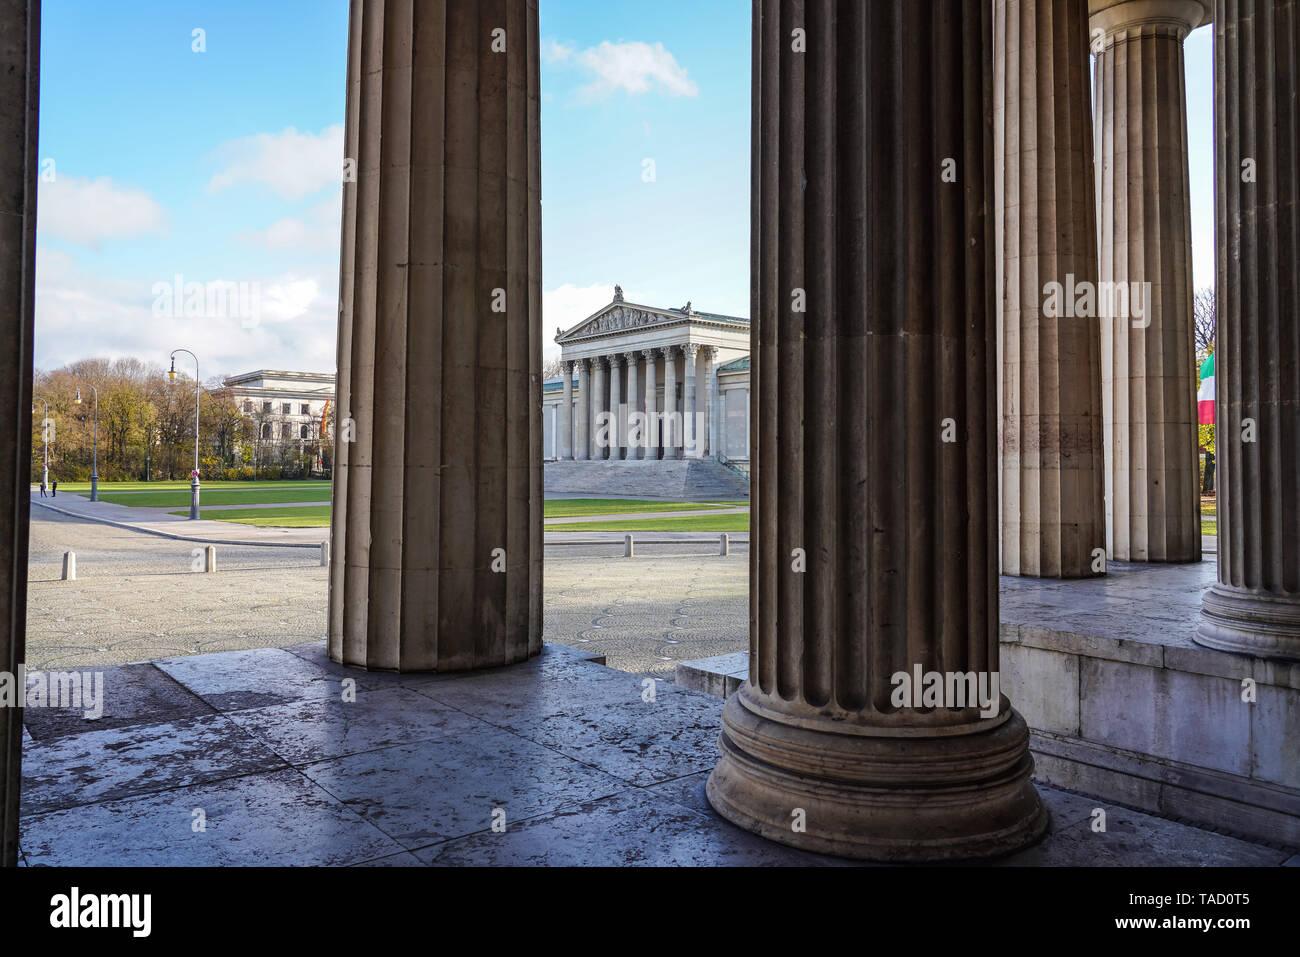 The Konigsplatz - Kings Square, state capital Munich - Bavaria - Munich, Germany - Stock Image